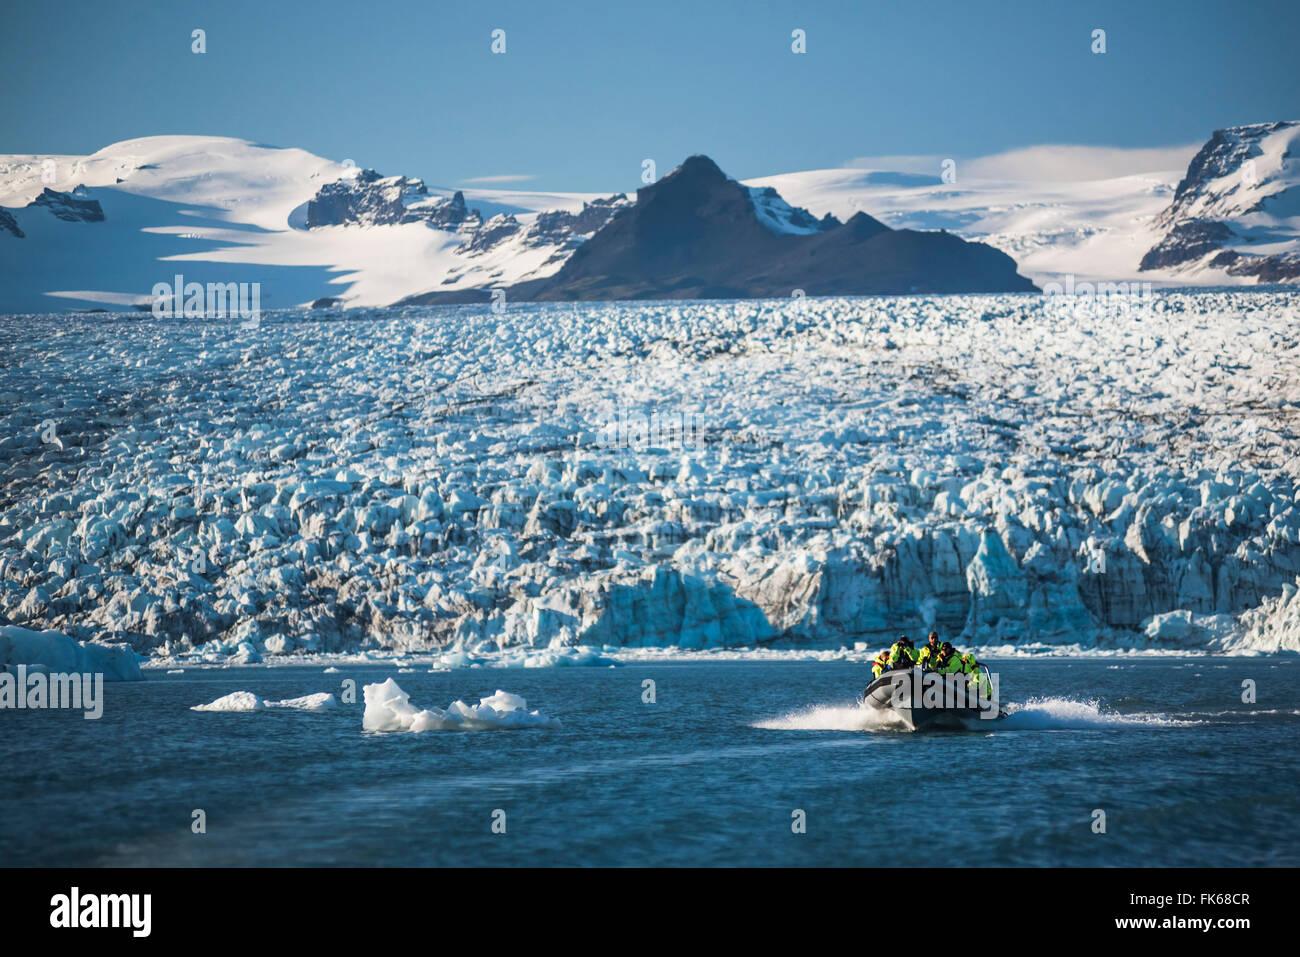 Zodiac boat tour on Jokulsarlon Glacier Lagoon, with Breidamerkurjokull Glacier and Vatnajokull Ice Cap behind, Stock Photo